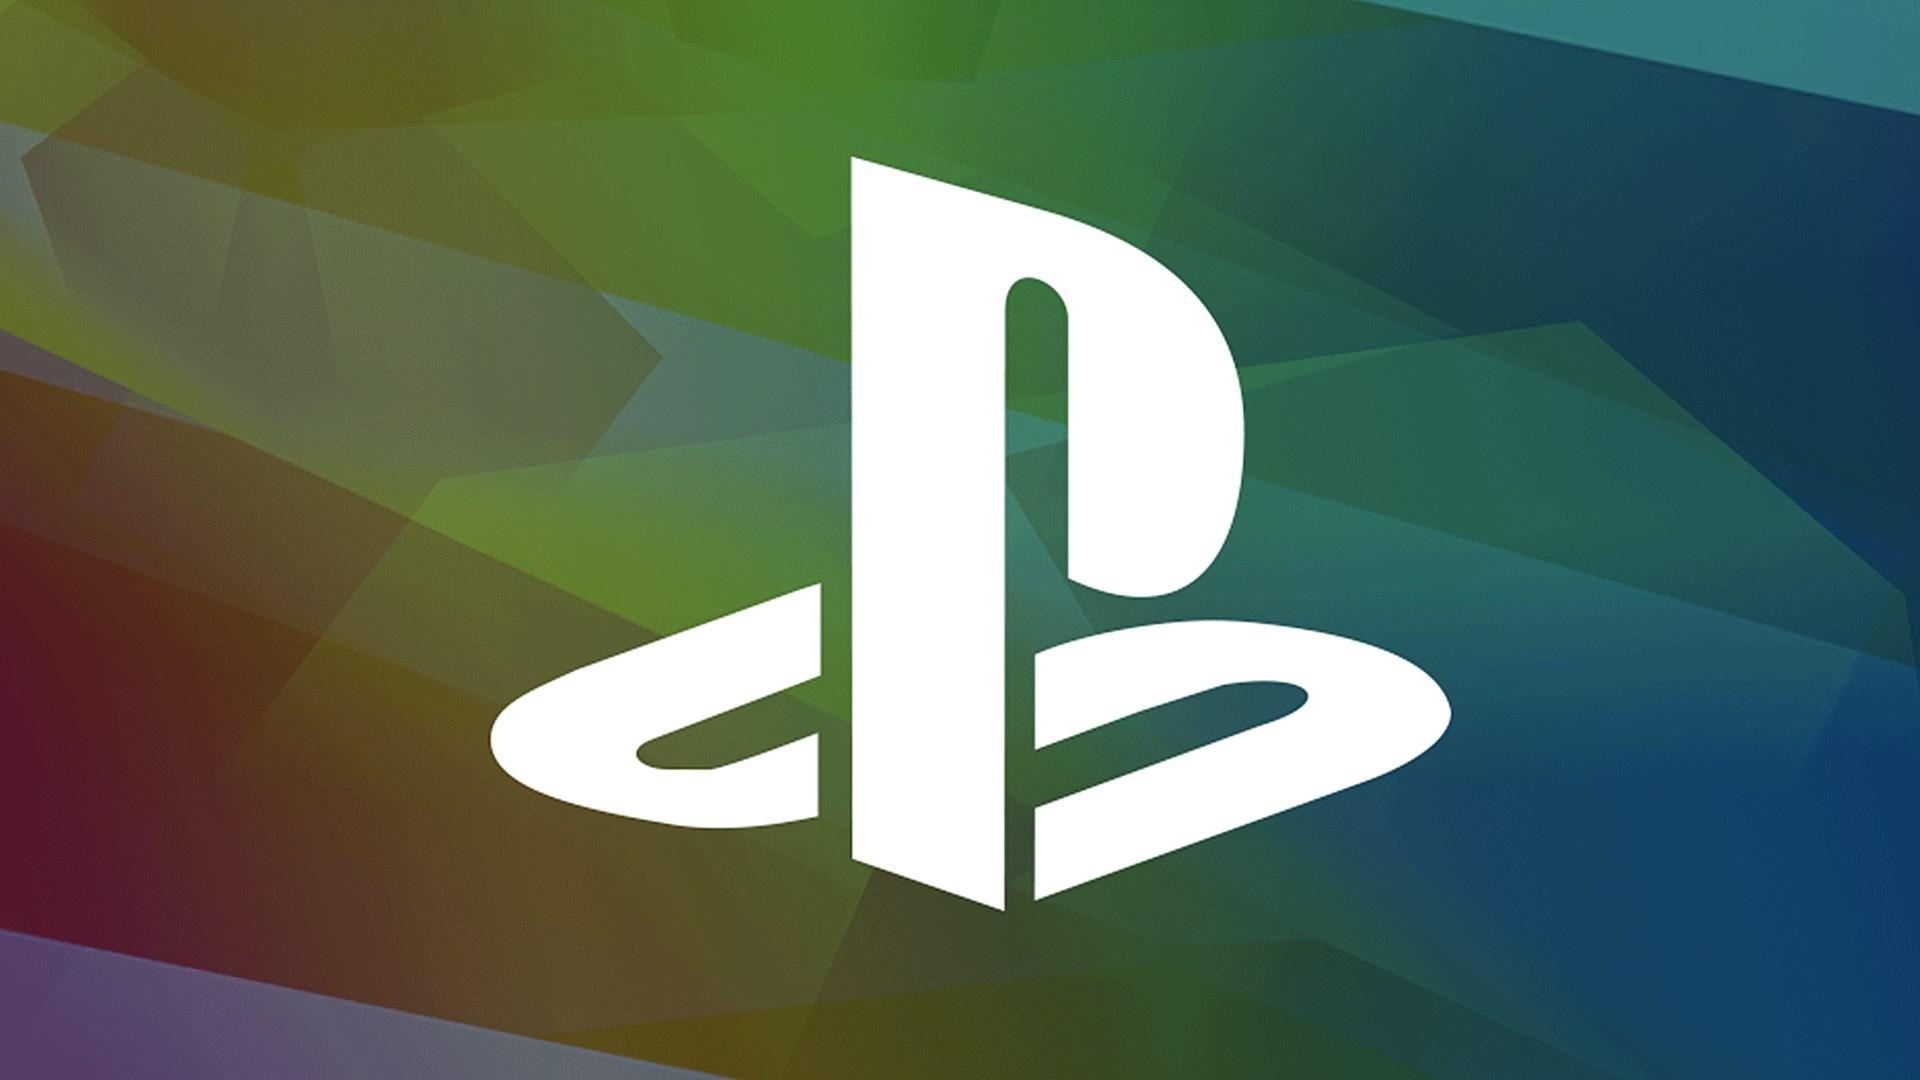 Sony, Logo, PlayStation 4, Playstation, Konsolen, PS4, Spielekonsole, Spielekonsolen, PlayStation 5, ps5, Sony PlayStation 5, 739700